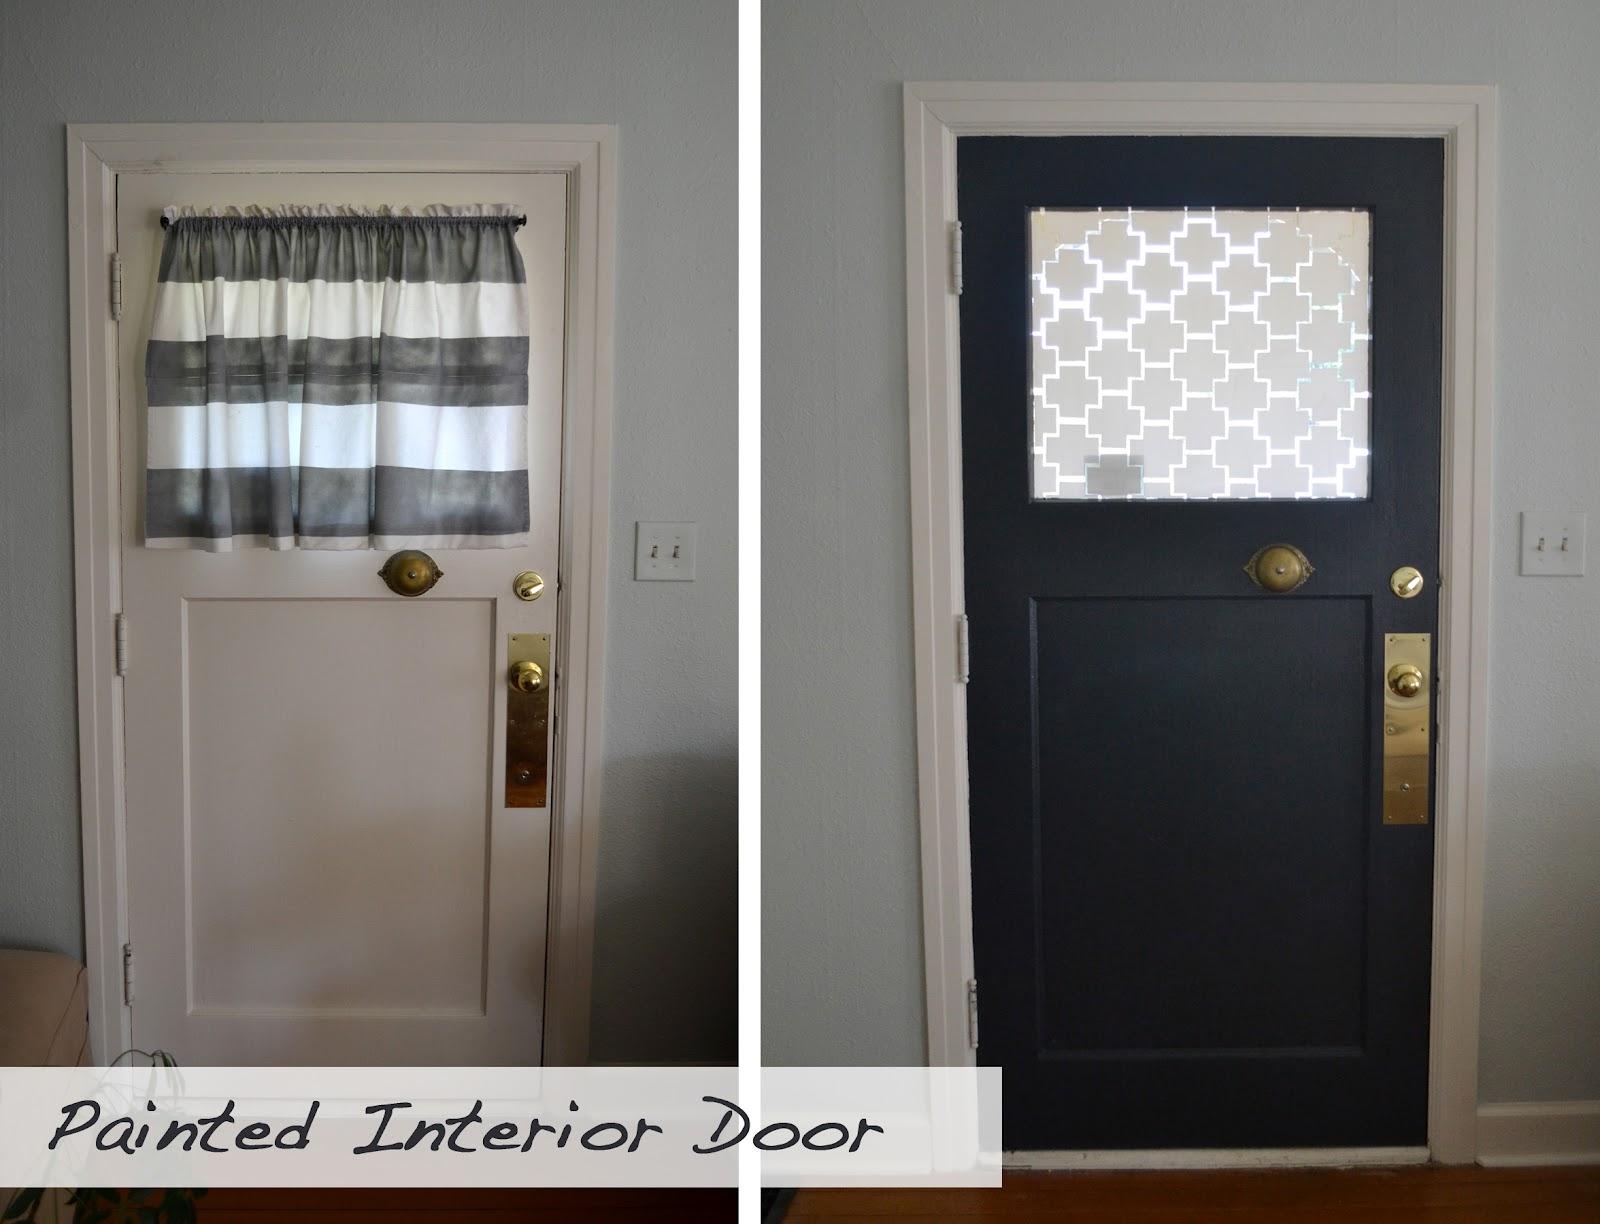 A home in the making renovate painted interior front door - Interior door with window on top ...